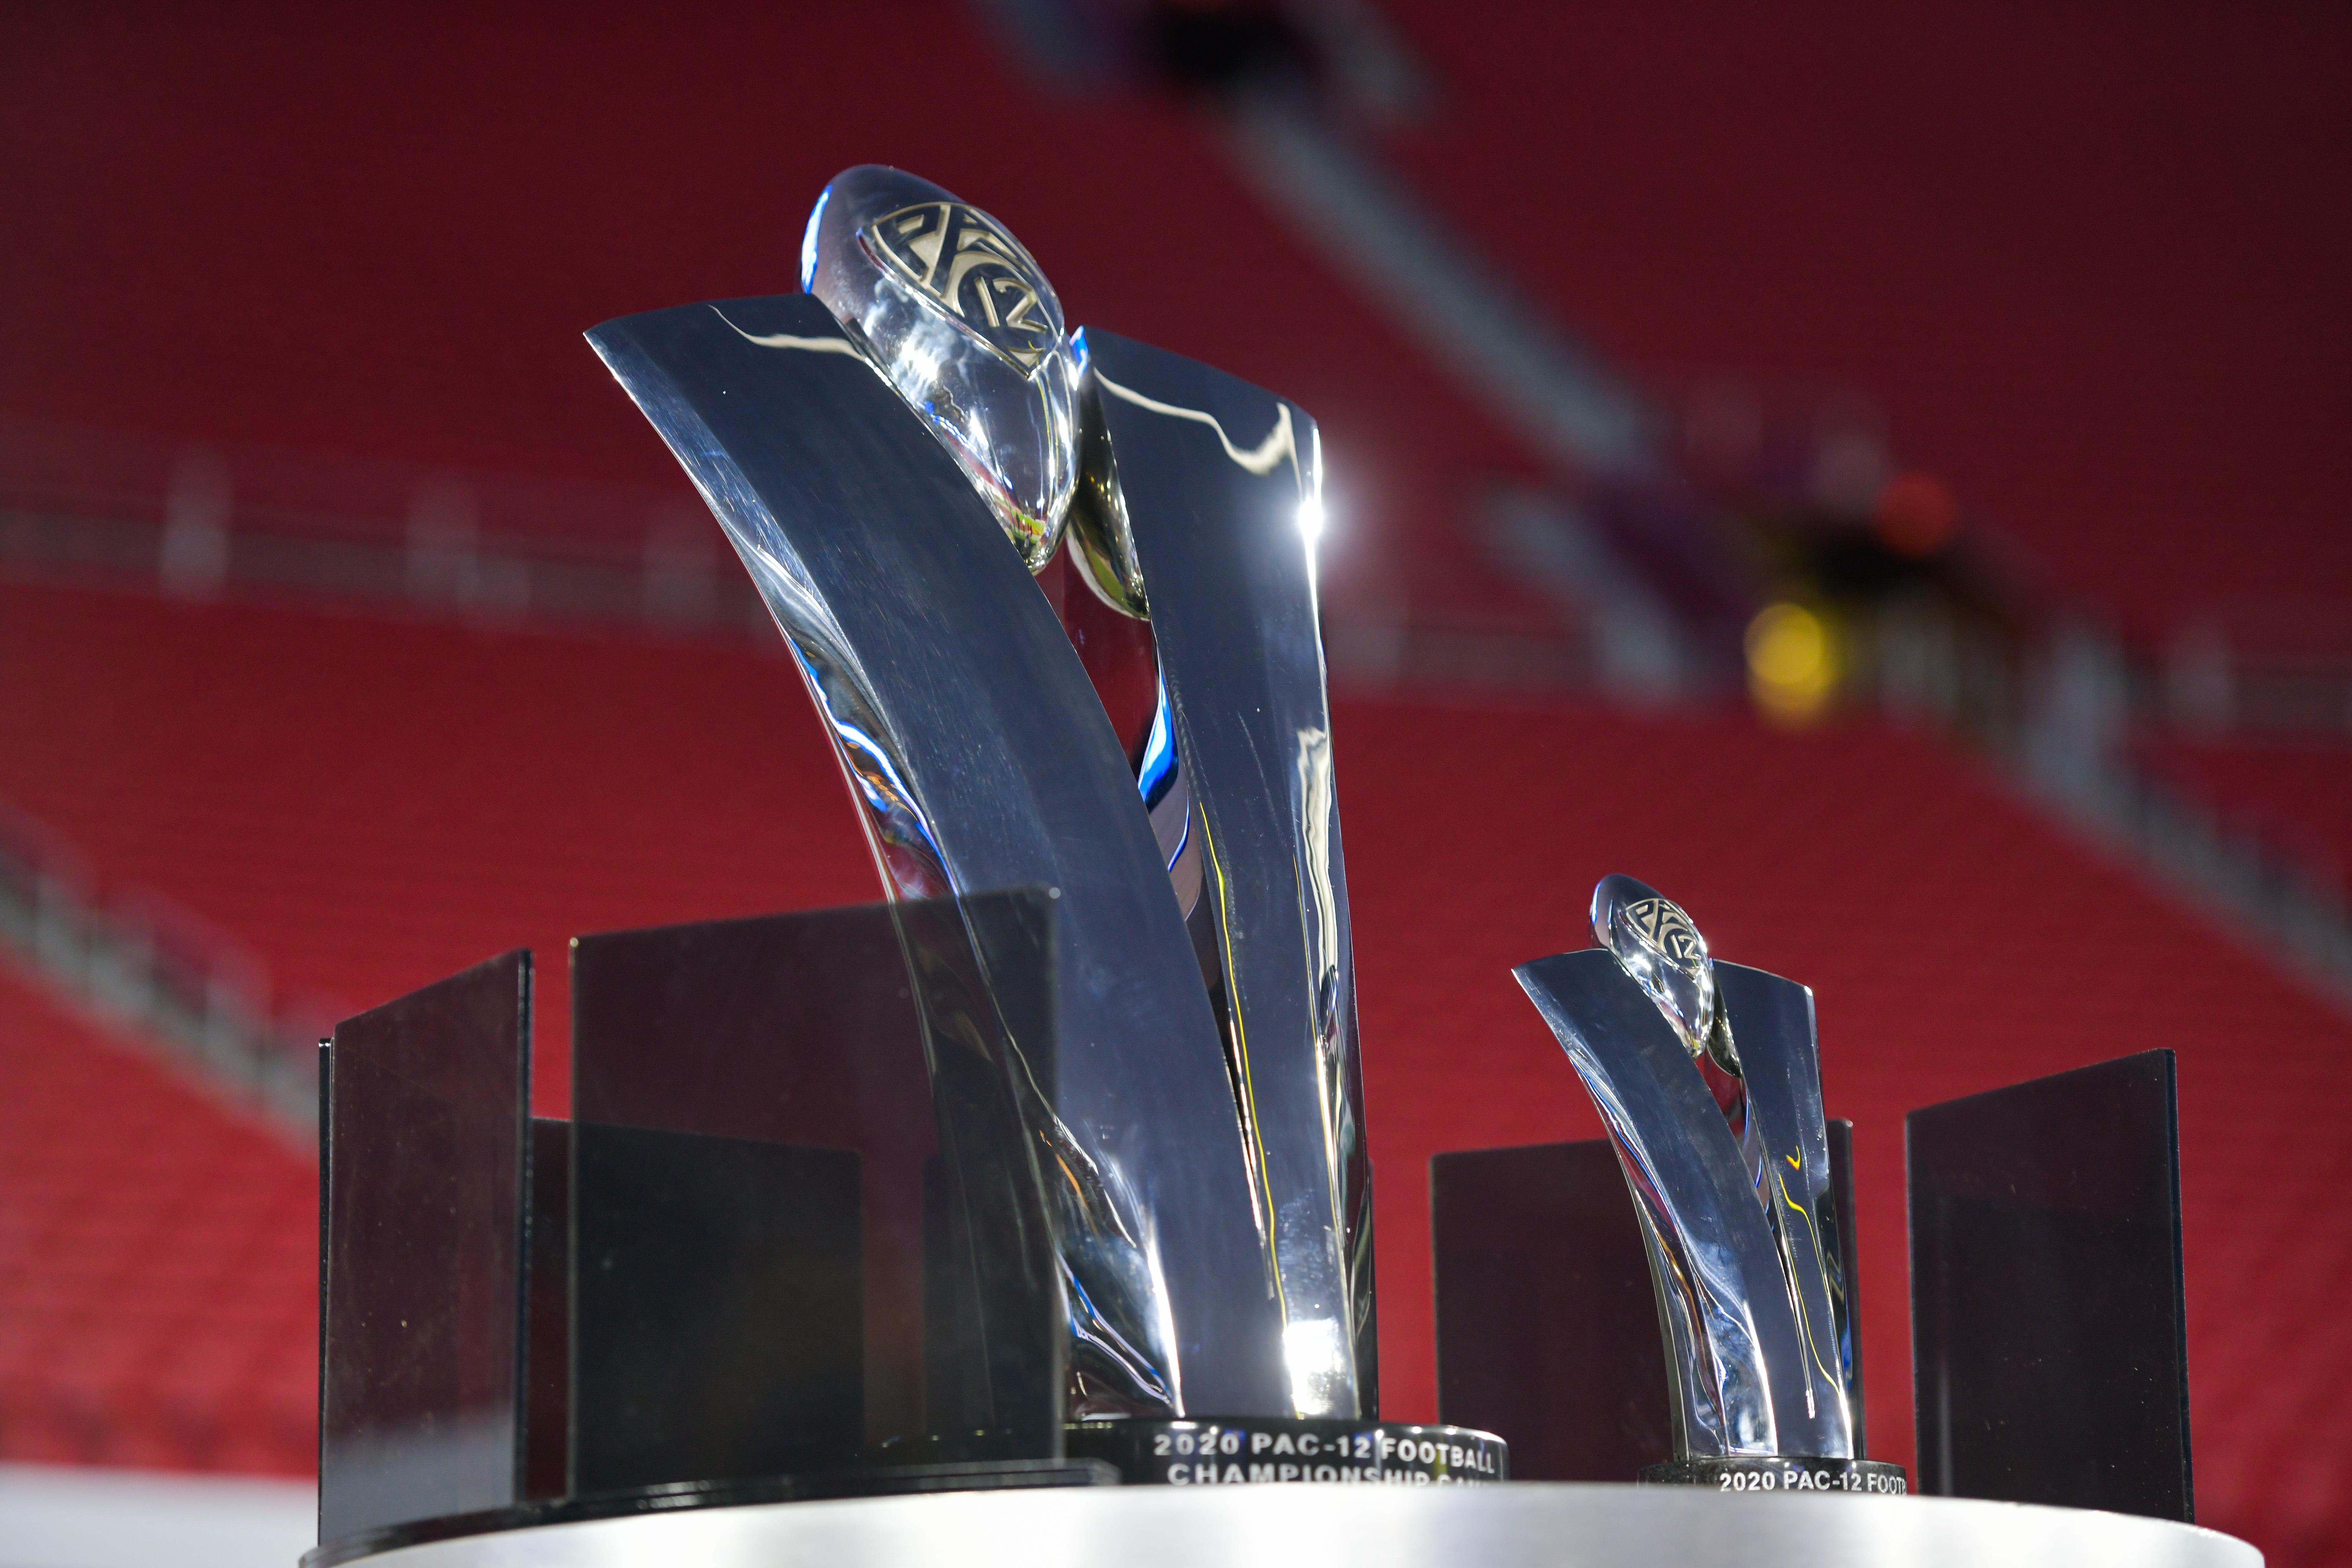 Pac-12 Championship trophy